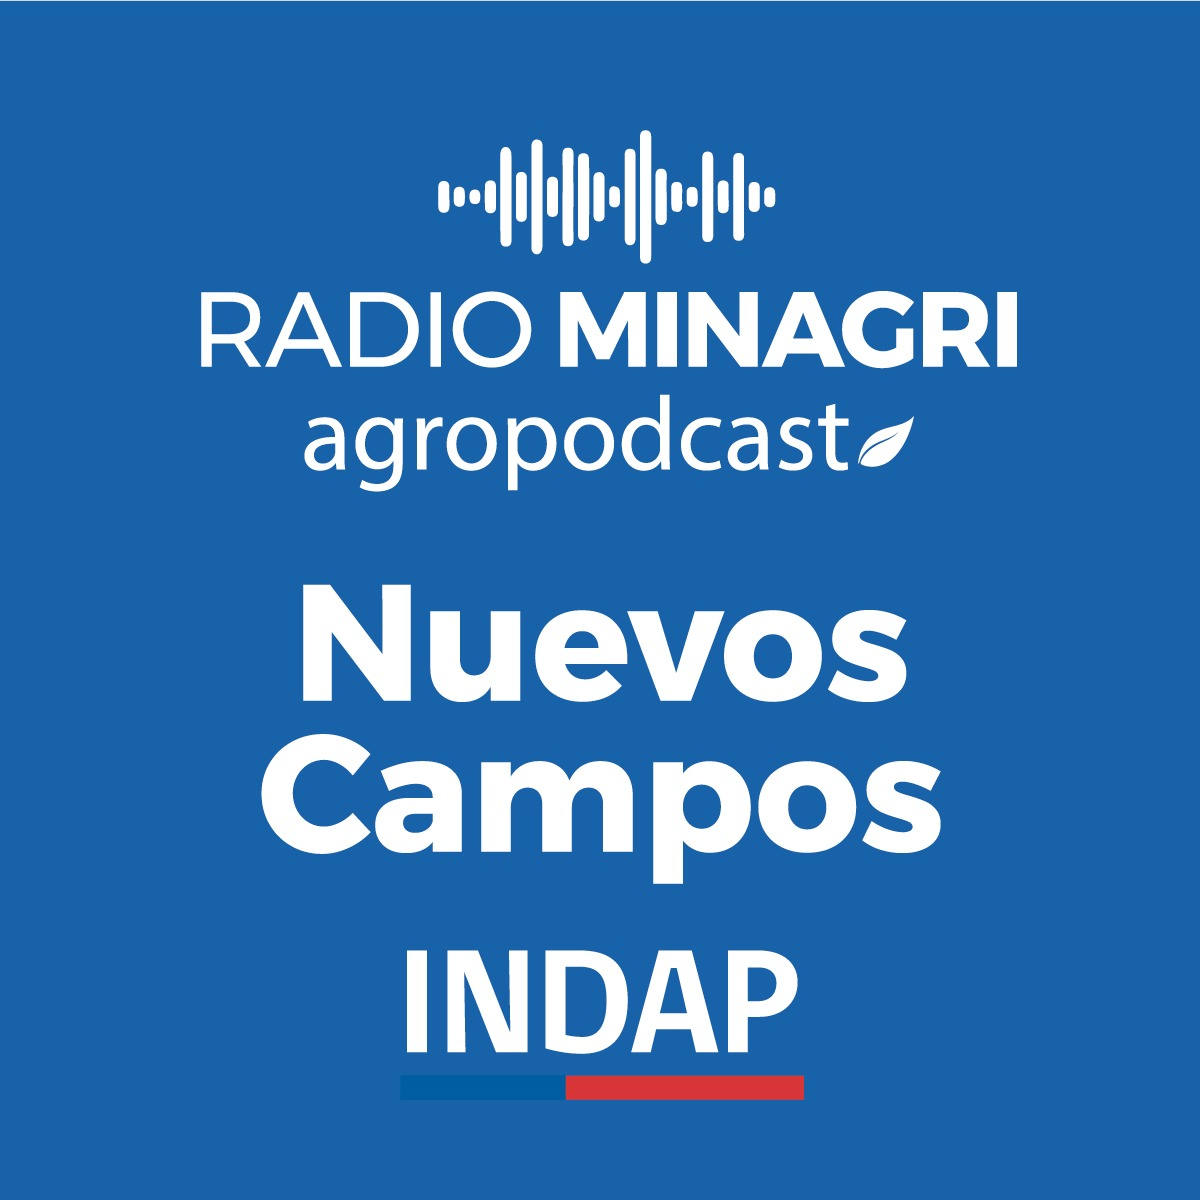 Nuevos campos – Episodio 27: Certificación de quinoa orgánica en Tarapacá